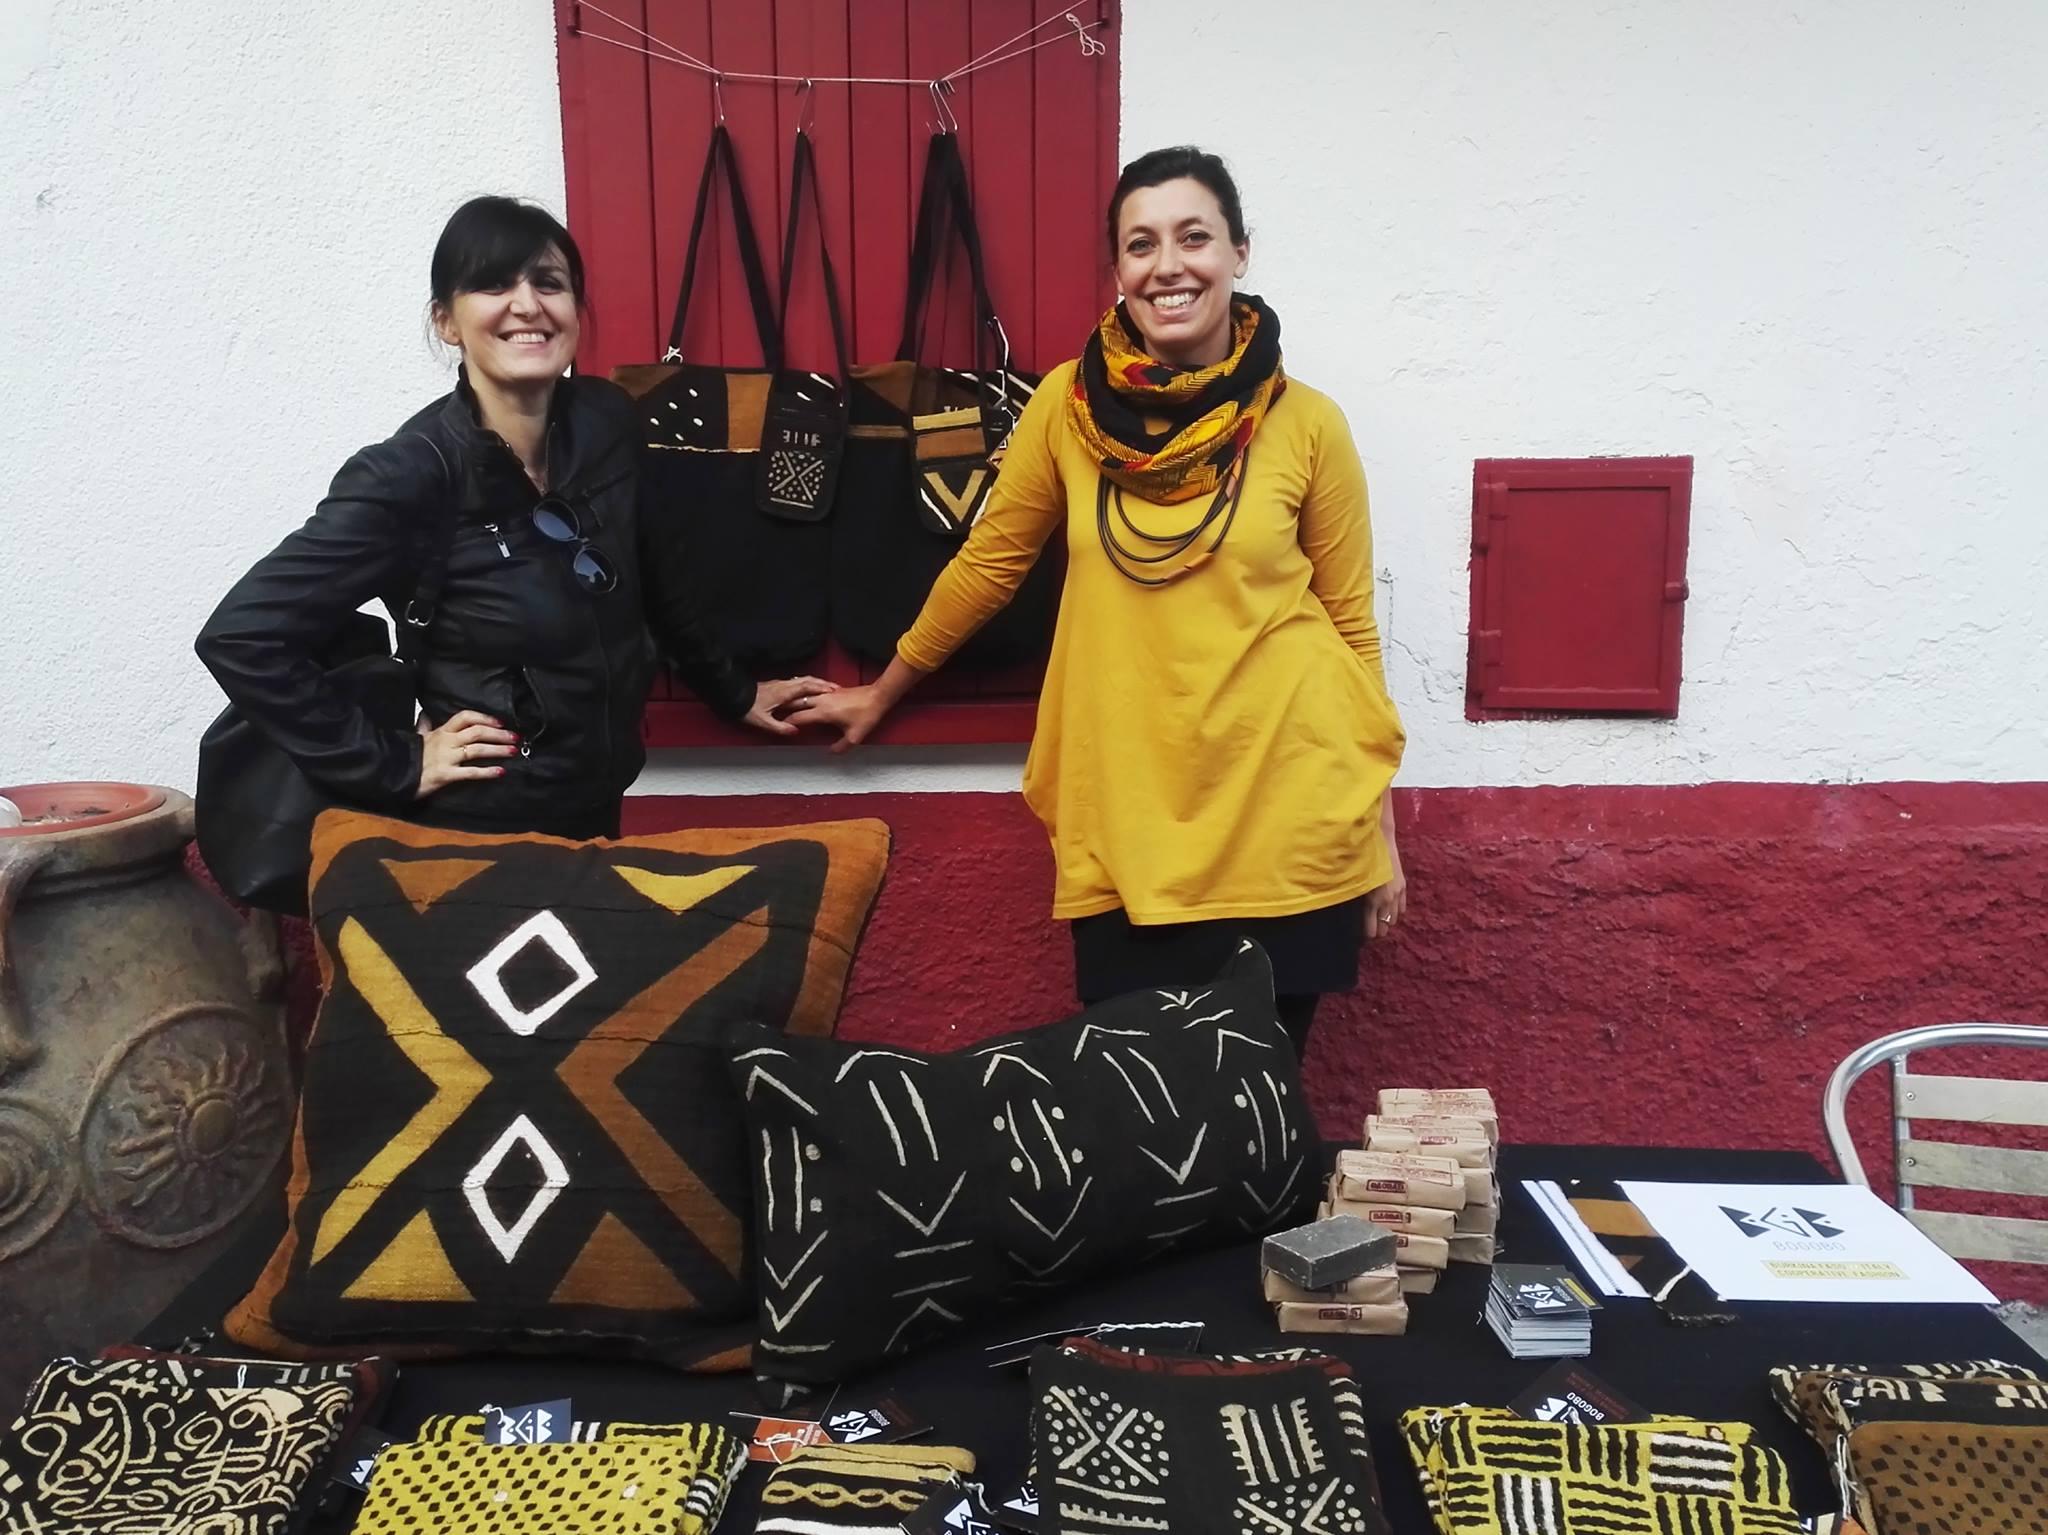 progetto BOGOBO - Patchanka